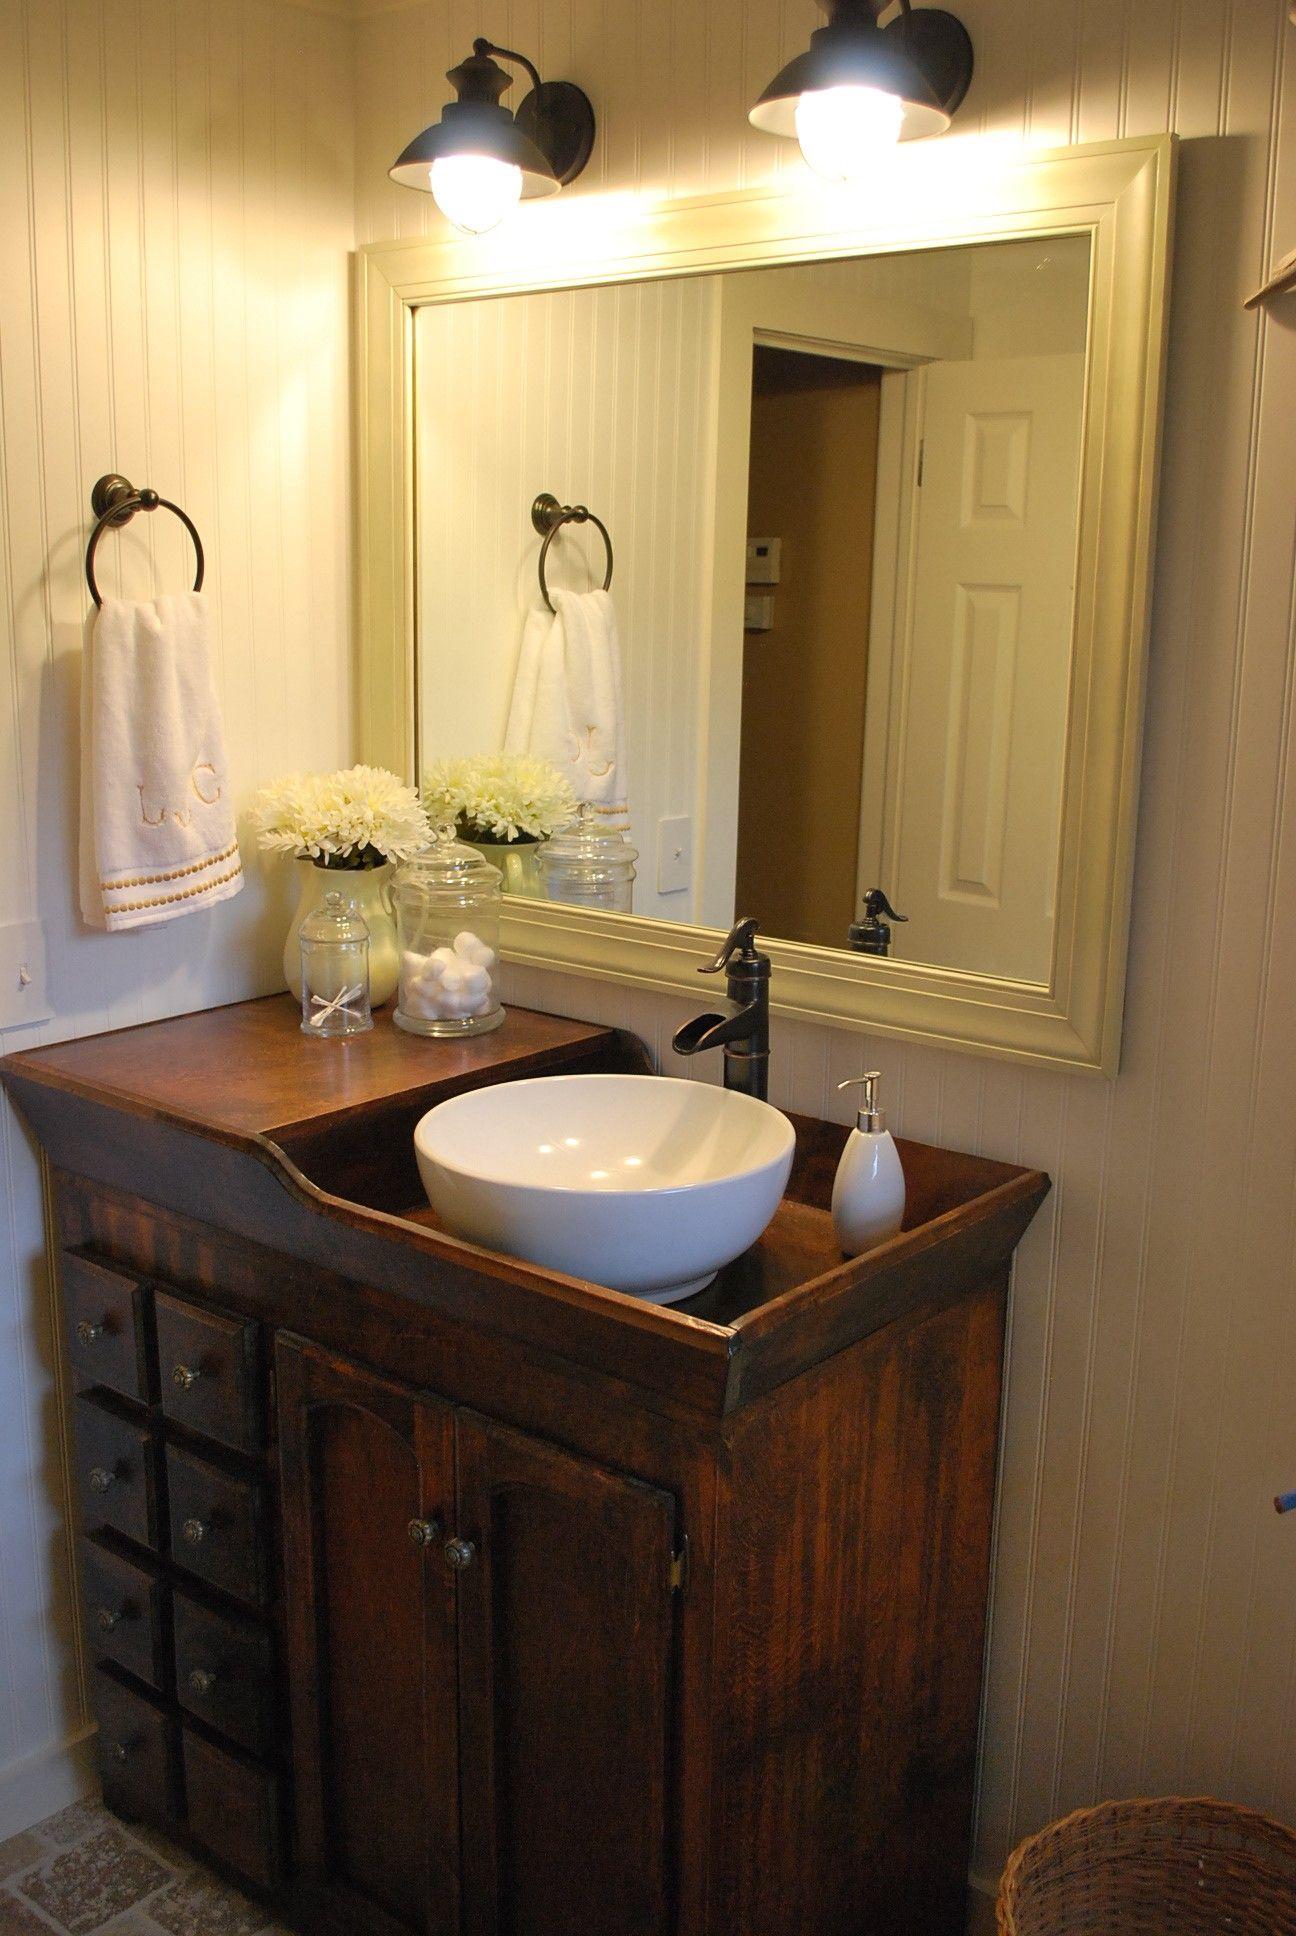 Bathroom Vanity Sizes And Corner Dark Brown Wooden Cabinets